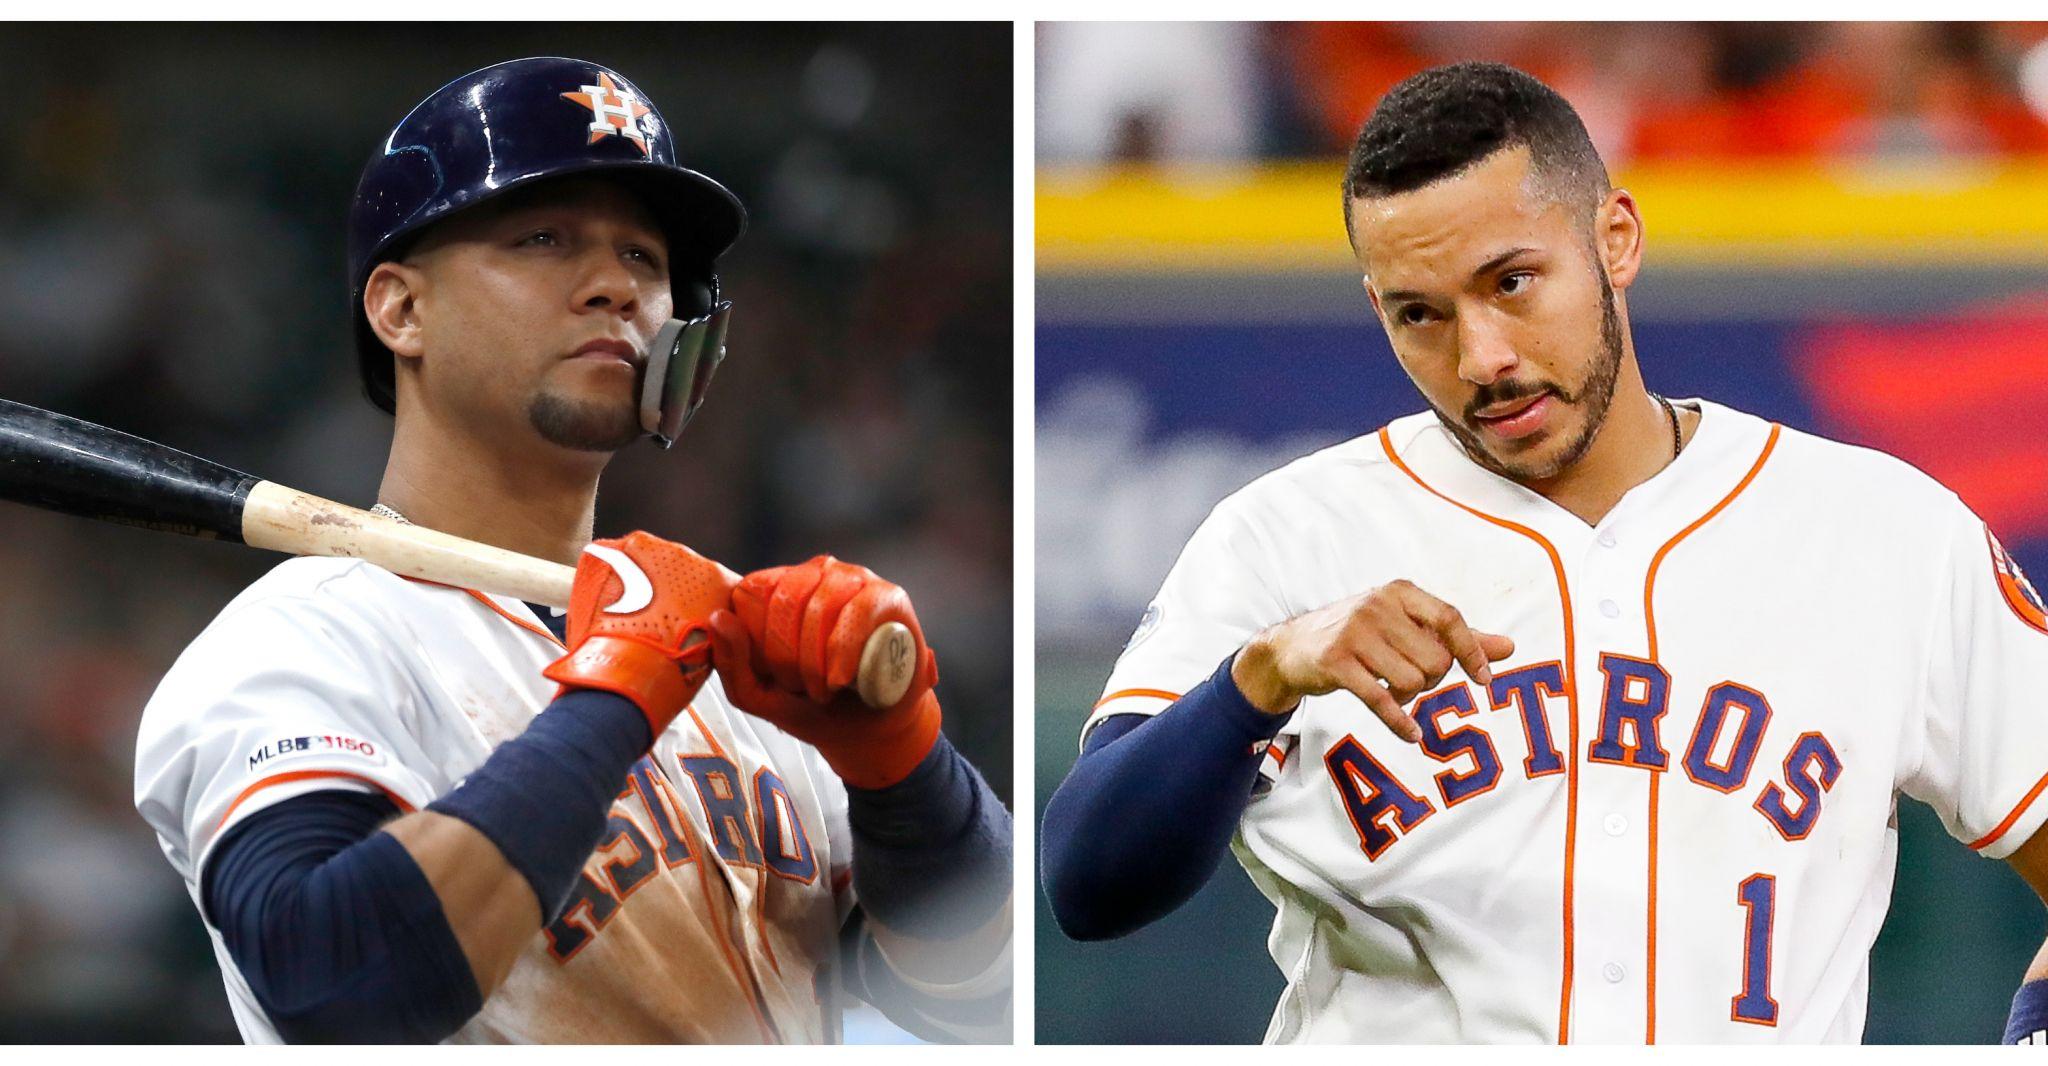 Astros injury report: Updates for Yuli Gurriel, Carlos Correa